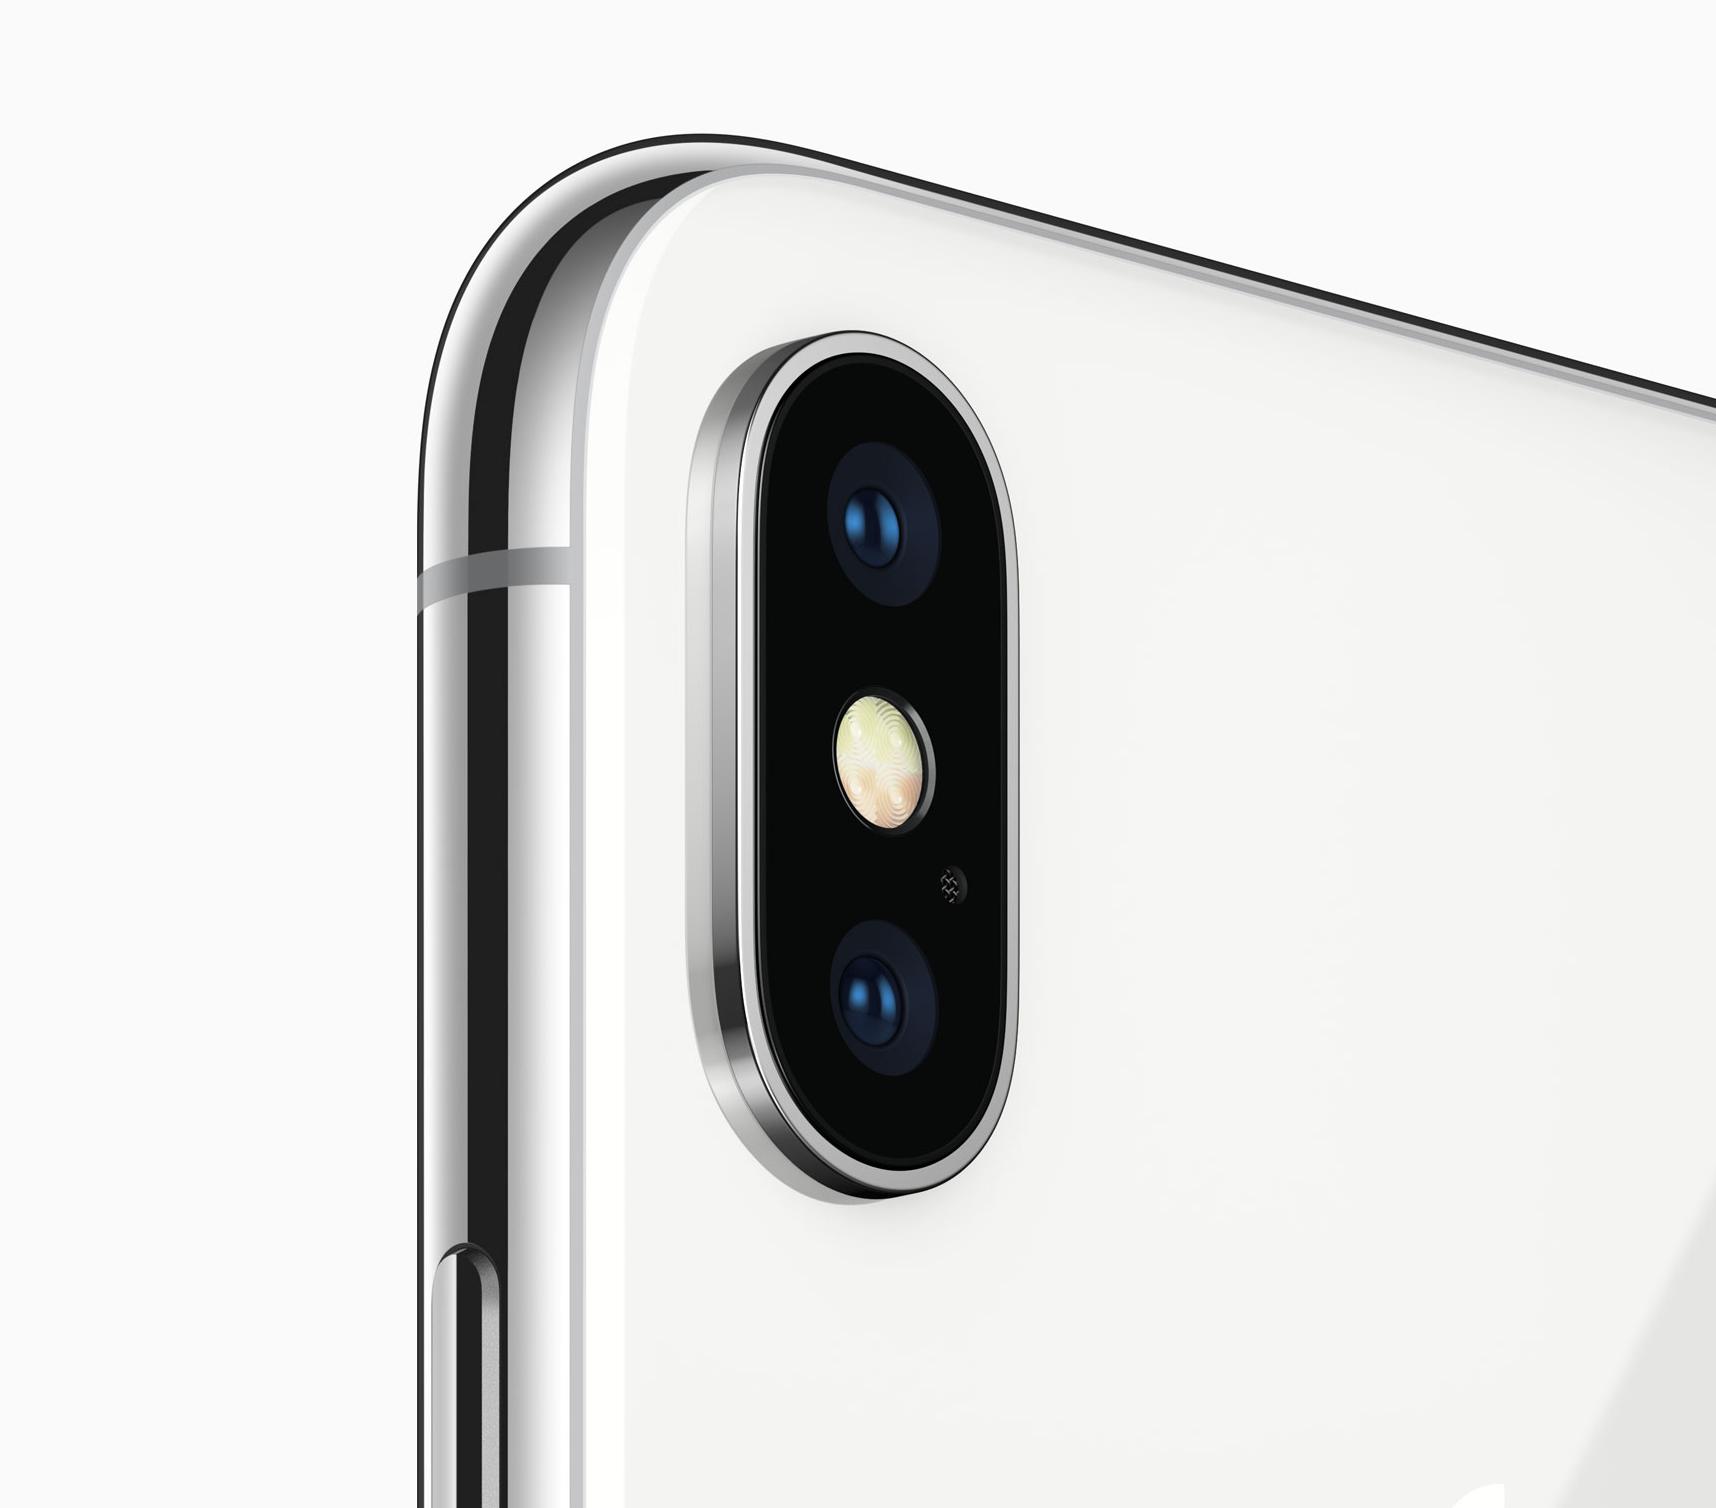 iphone x 2019 weitere ger chte um triple kamera und oled. Black Bedroom Furniture Sets. Home Design Ideas